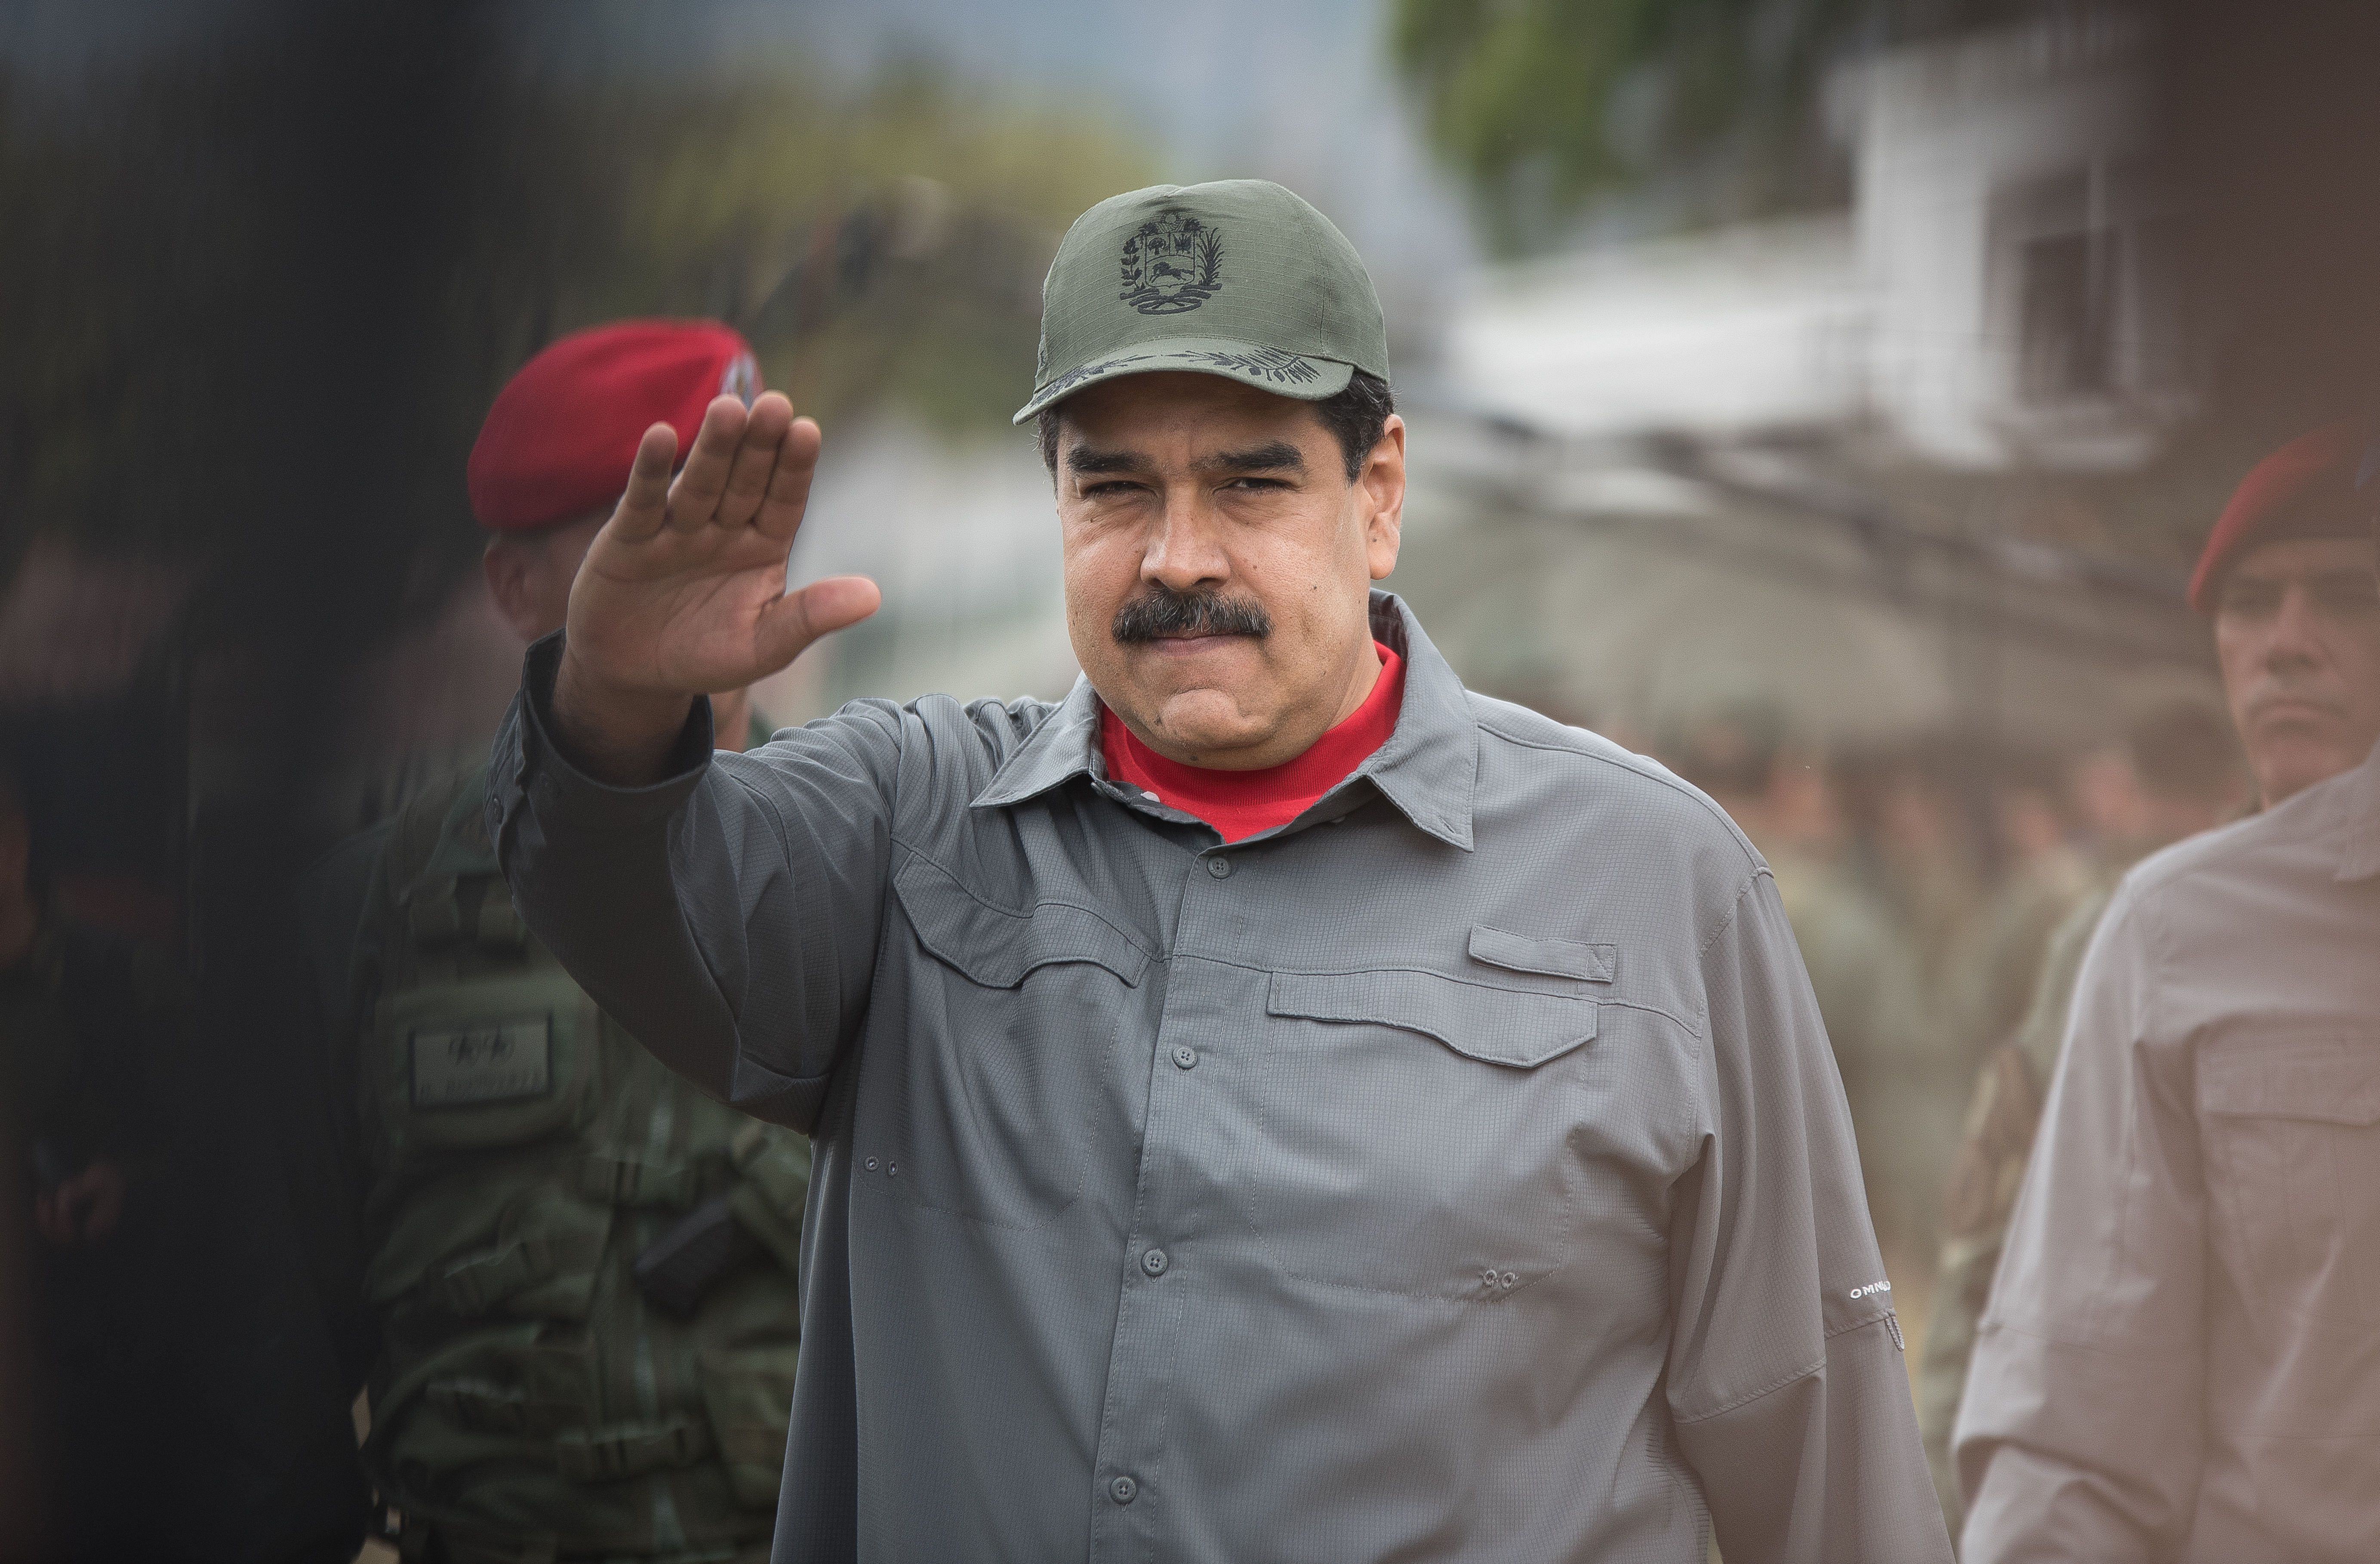 Venezuelan president Nicolás Maduro doesn't like cryptocurrencies, unless he created them himself.